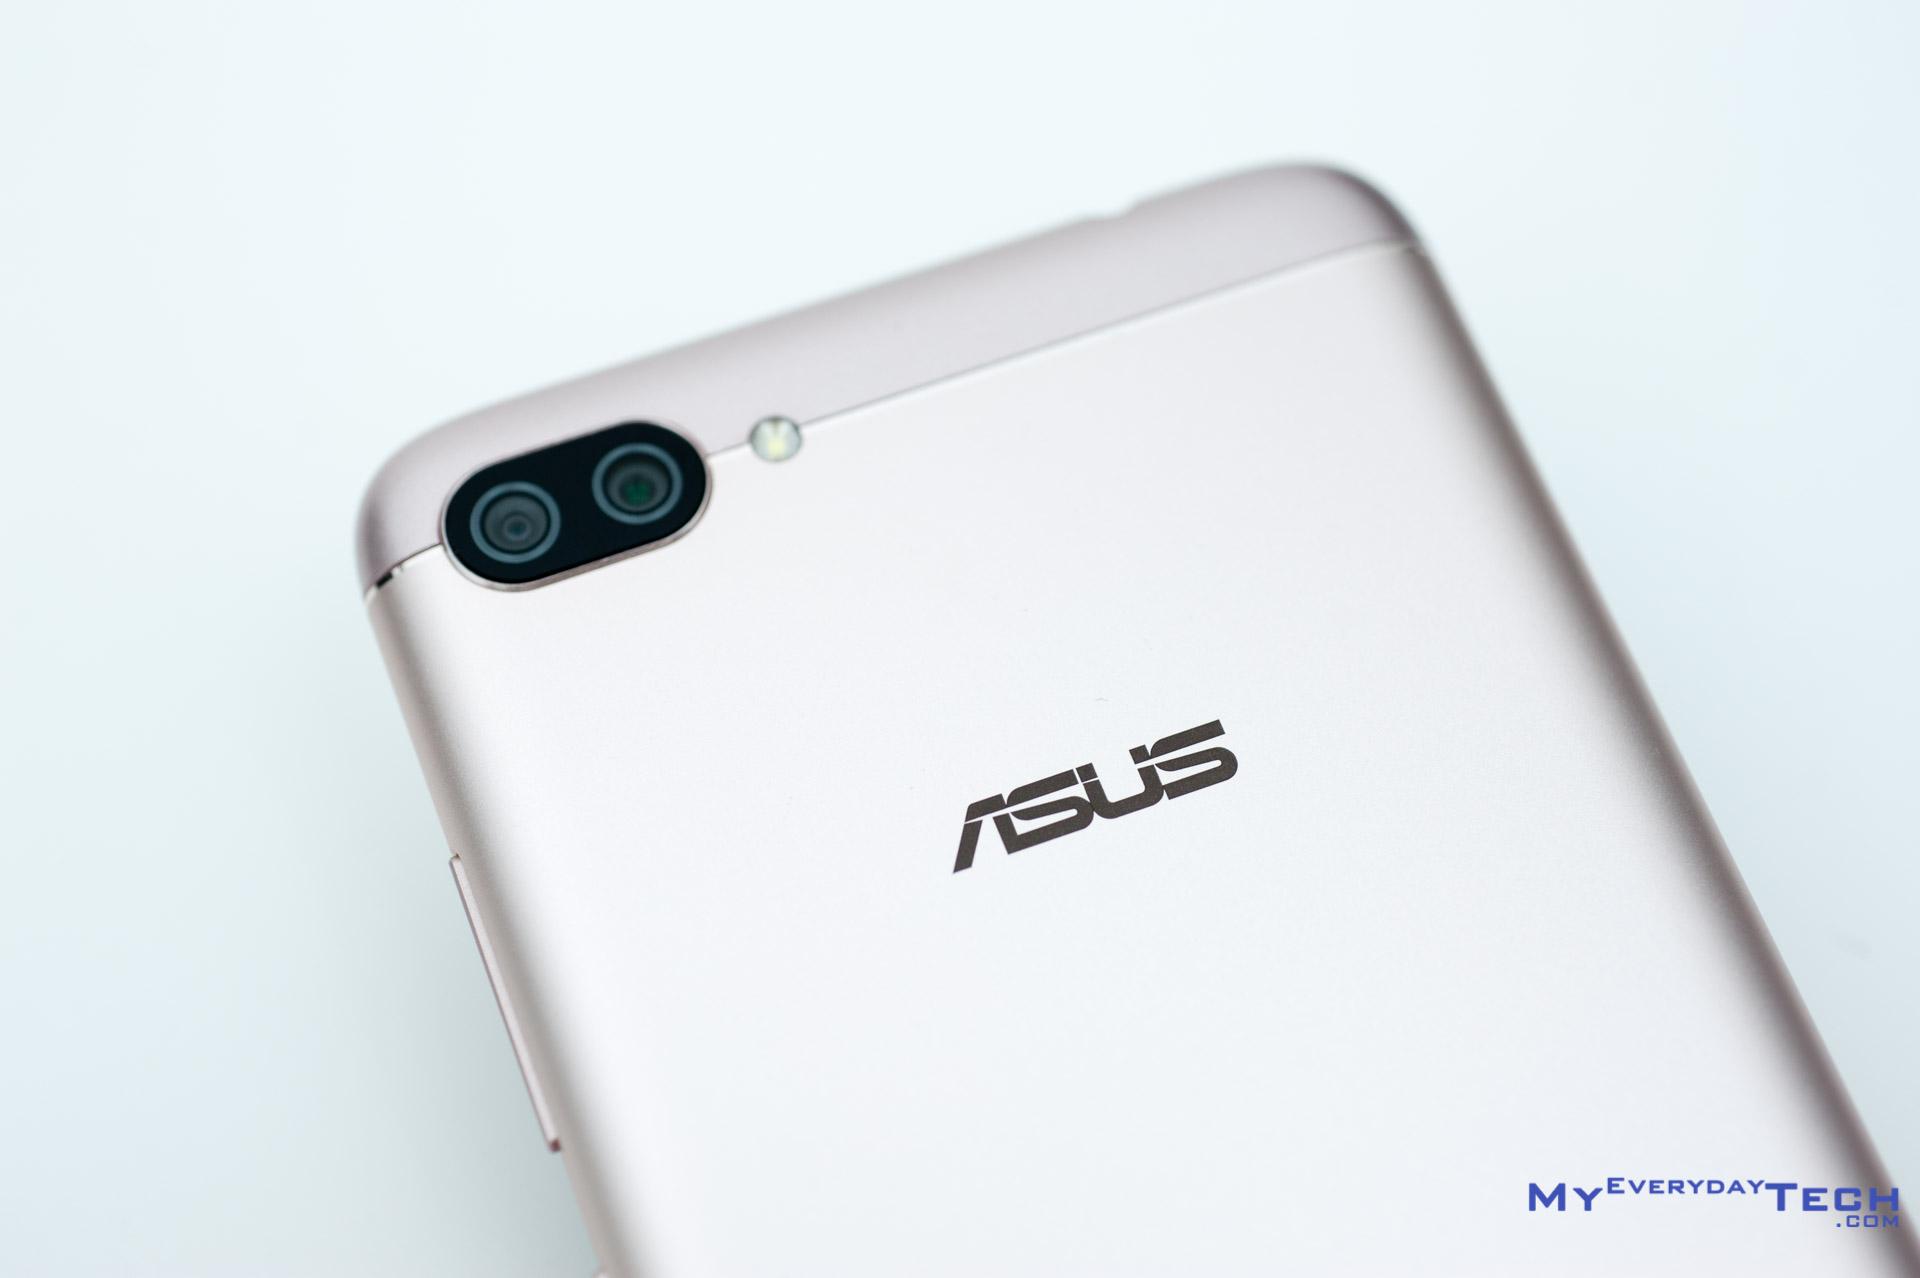 Asus zenfone 4 max pro review maximum longevity asus zenfone 4 max pro review stopboris Images